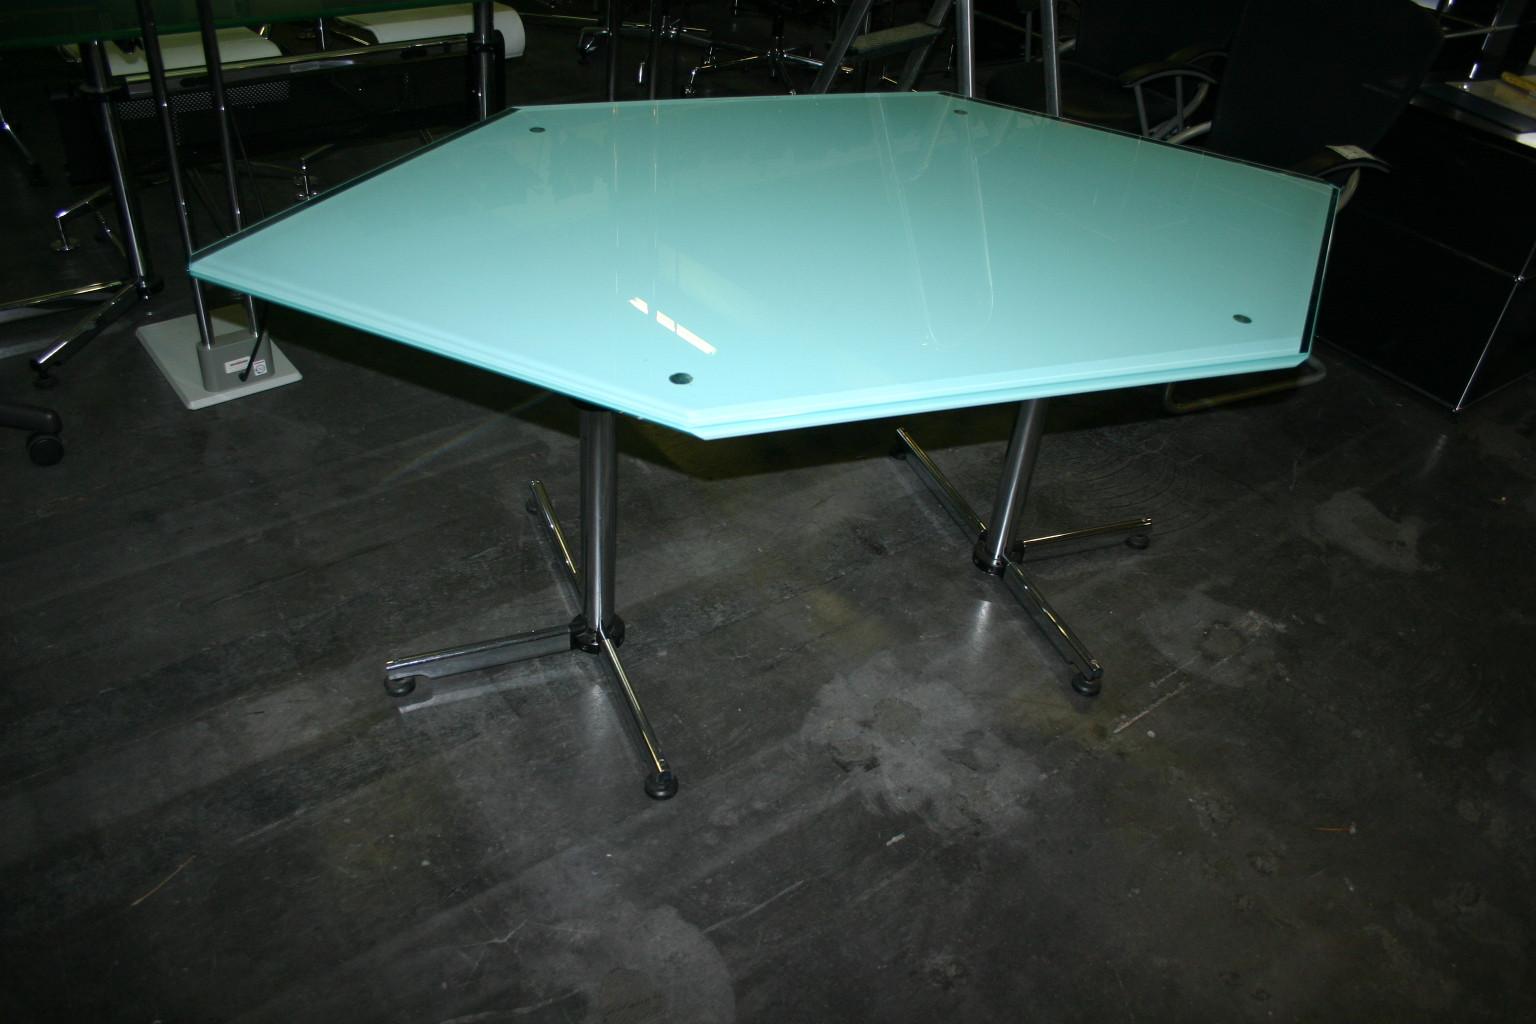 glastisch von usm haller kitos. Black Bedroom Furniture Sets. Home Design Ideas